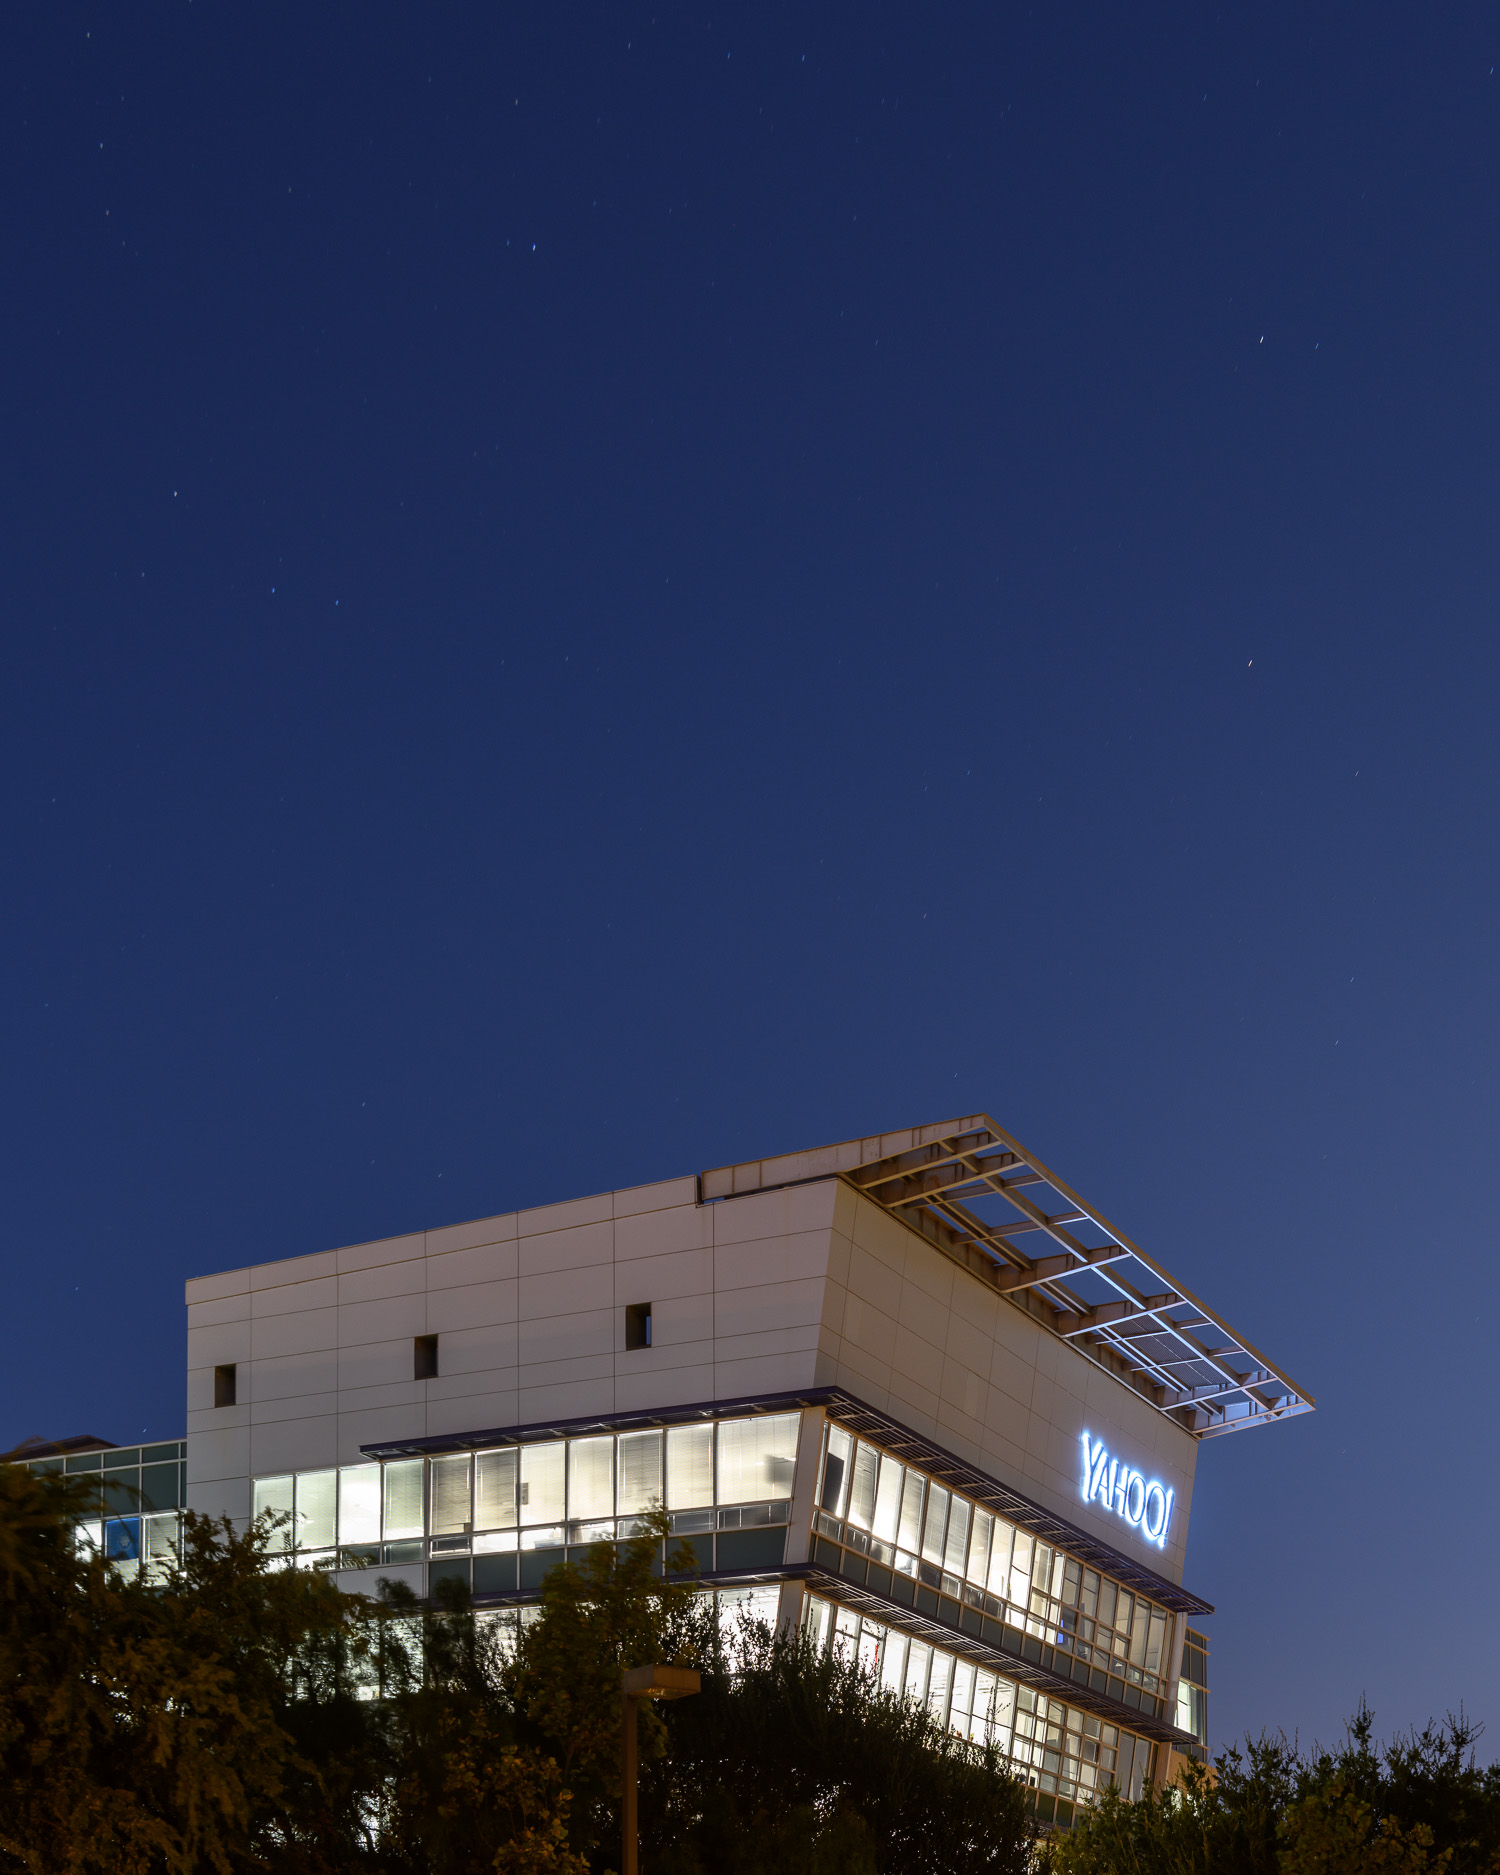 Yahoo! headquarters, Sunnyvale